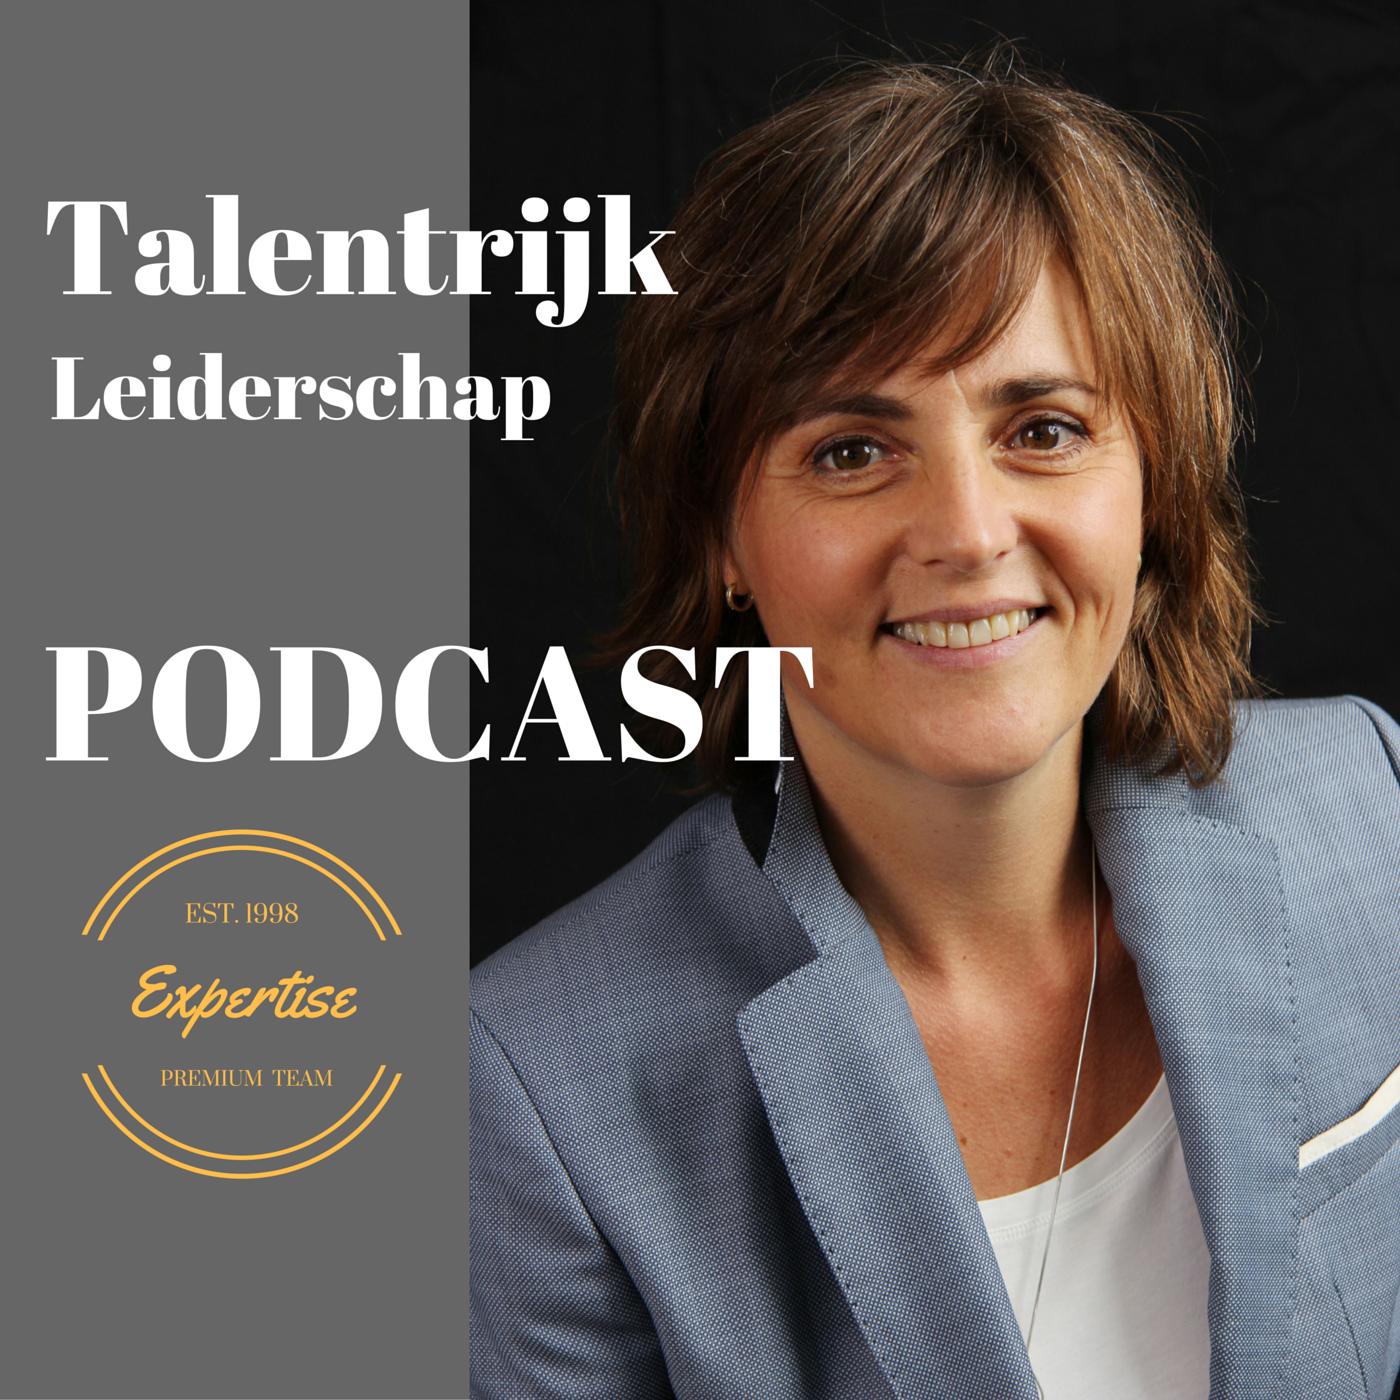 Podcast Axis Consultancy Talentrijk leiderschap talentrijke teams